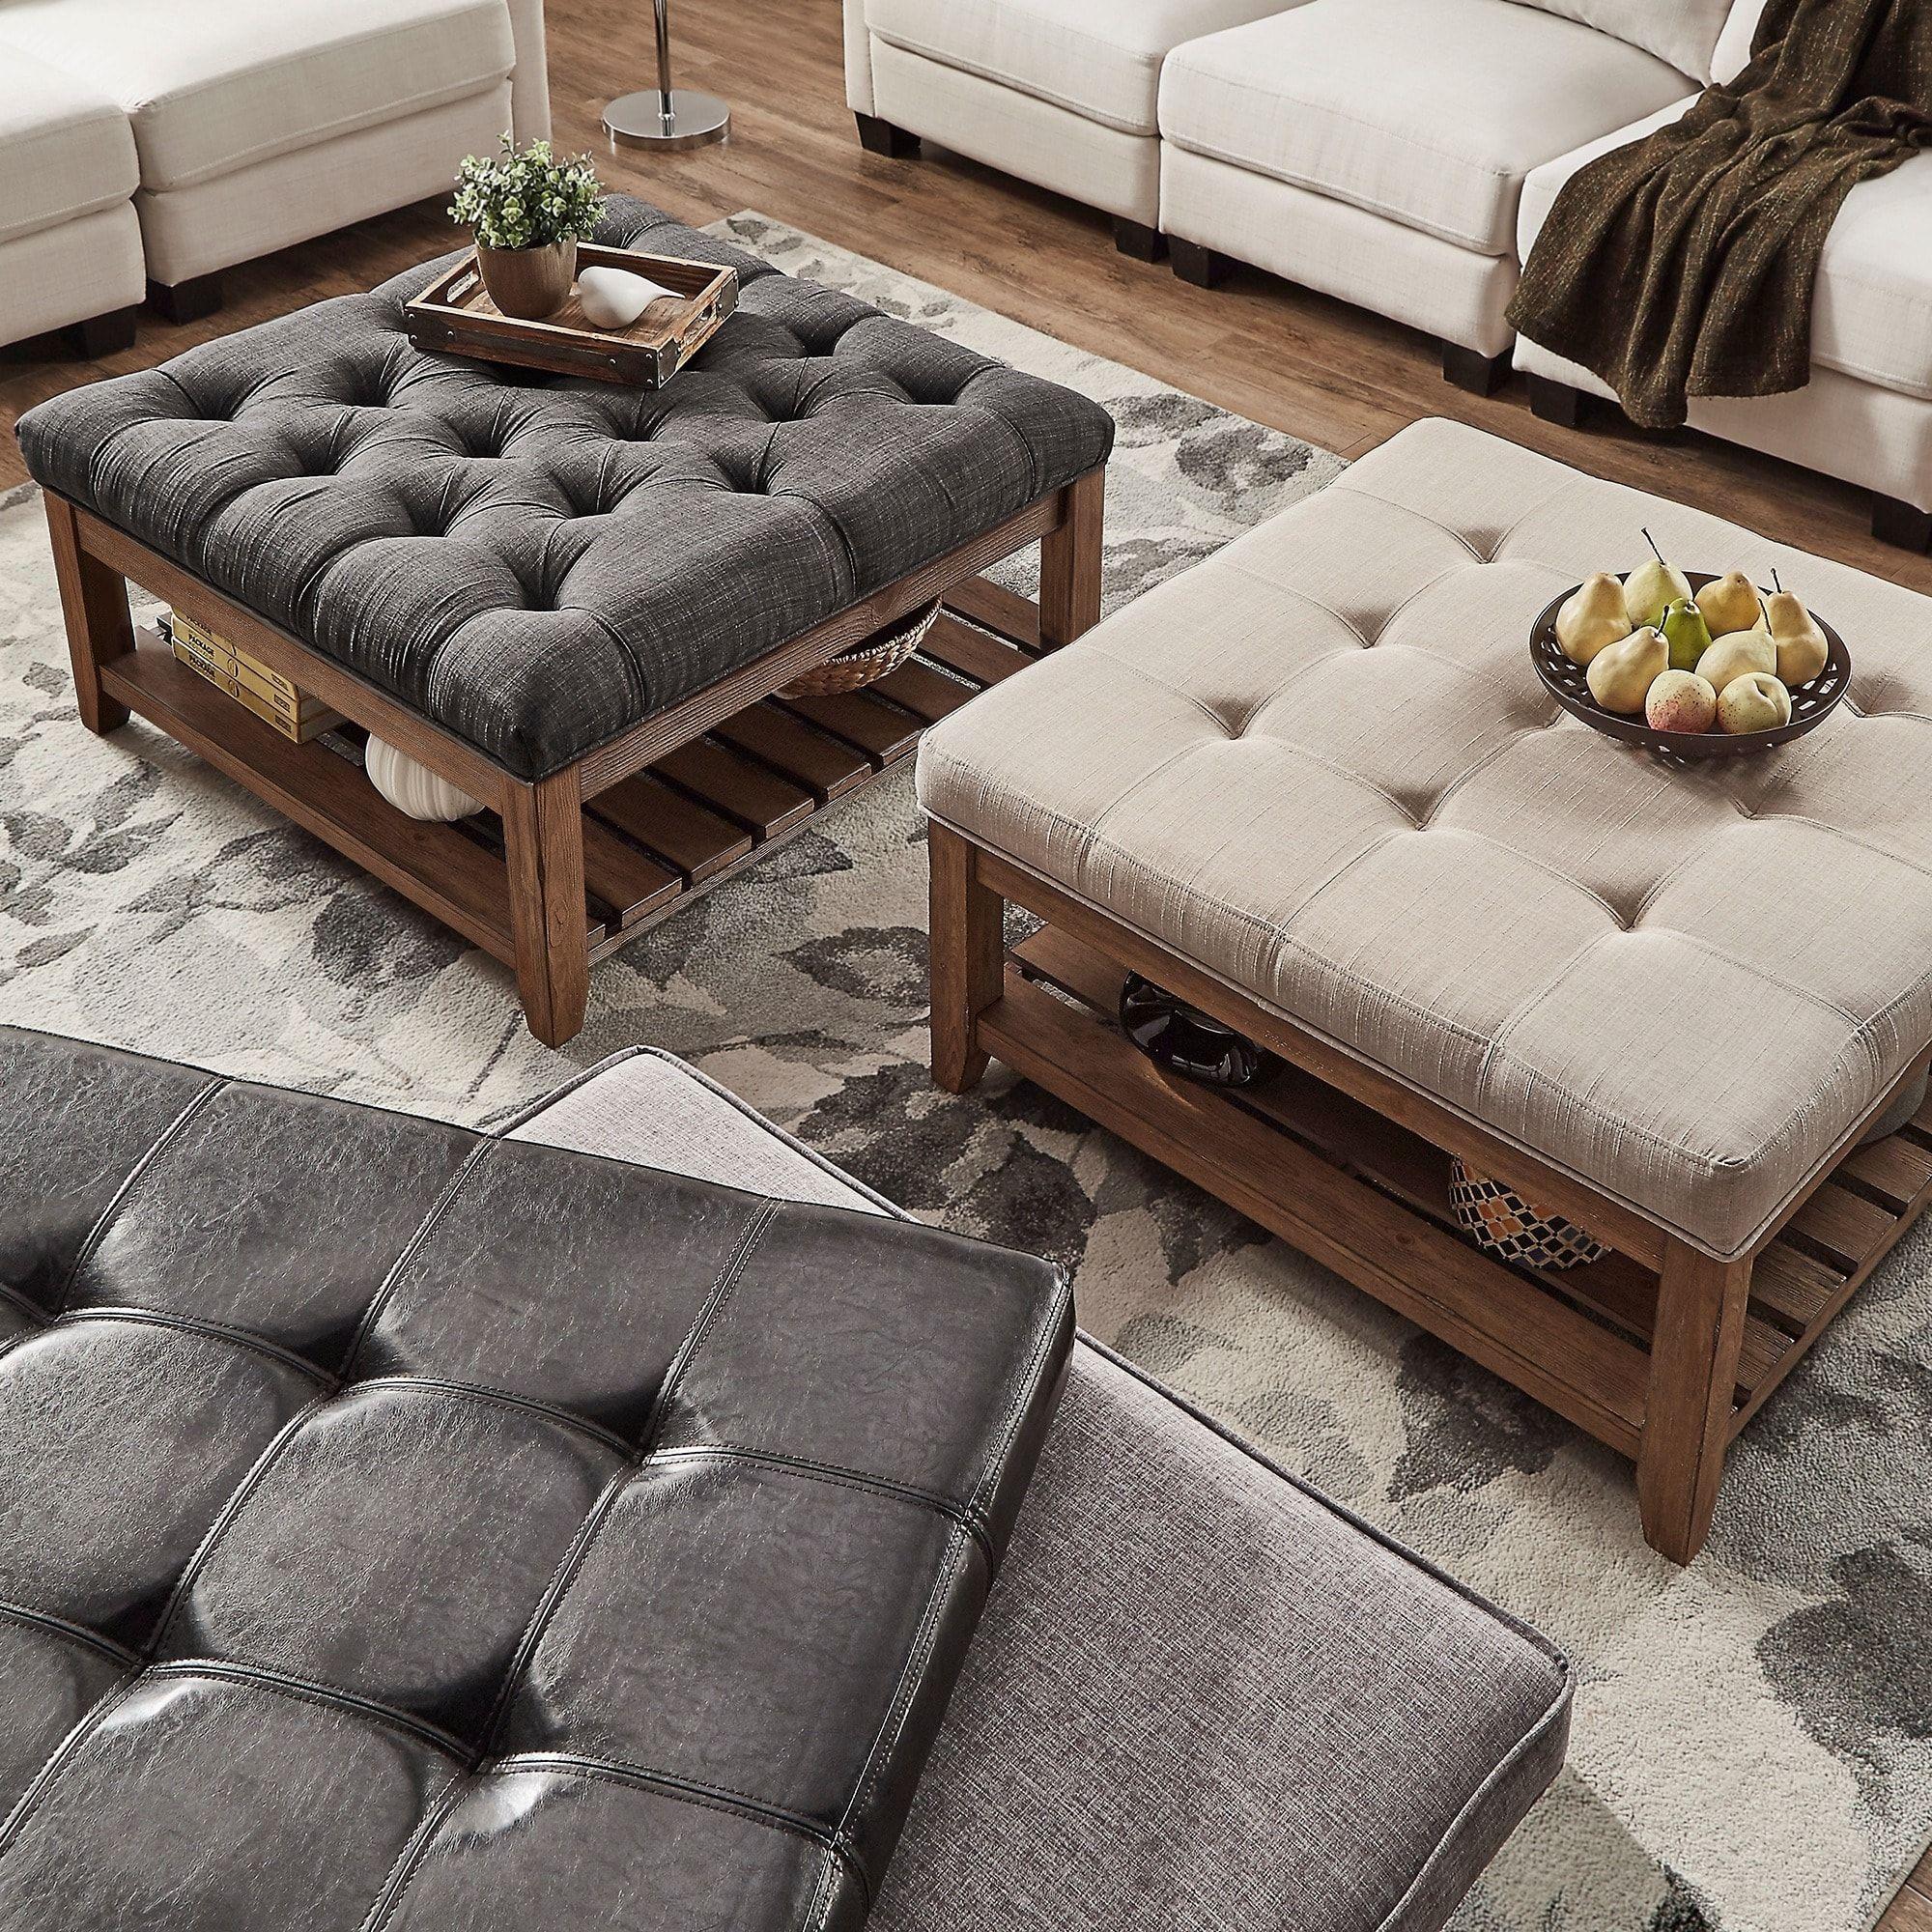 Our Best Living Room Furniture Deals Tufted Ottoman Coffee Table Storage Ottoman Coffee Table Ottoman Coffee Table [ 2000 x 2000 Pixel ]